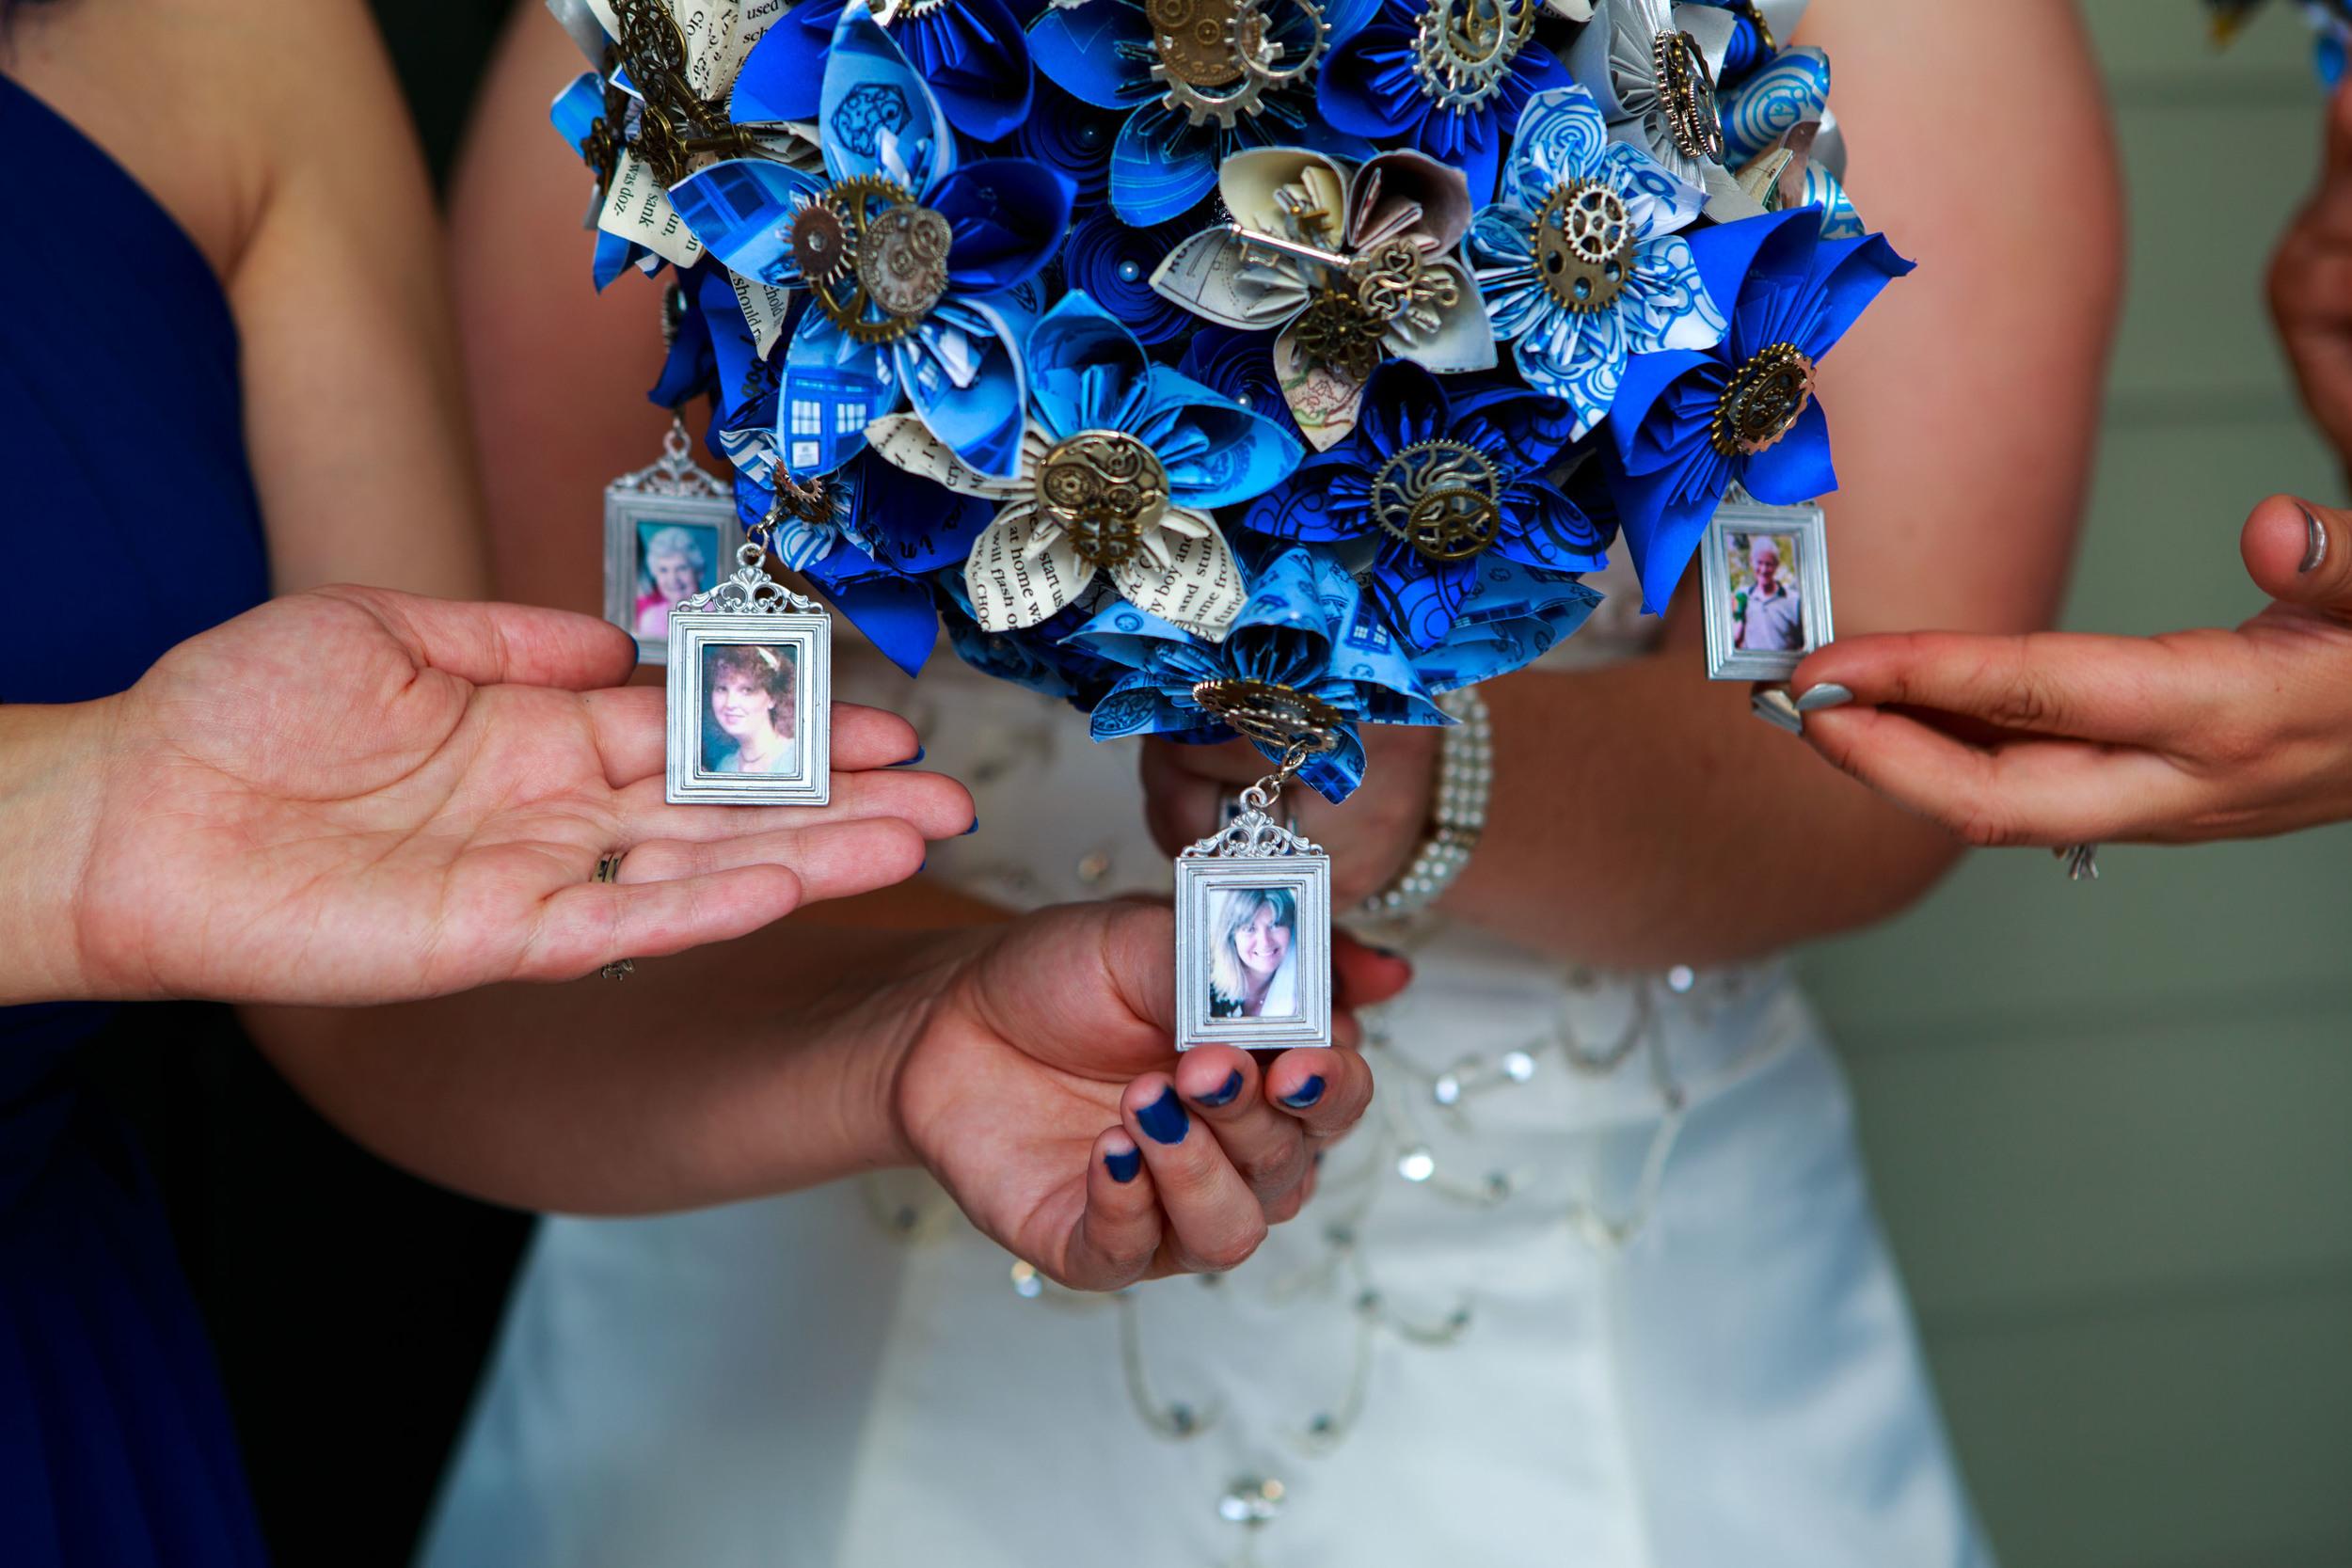 NC_Wedding_Photographer_Tiffany_Abruzzo_Family_Portraits_28.jpg